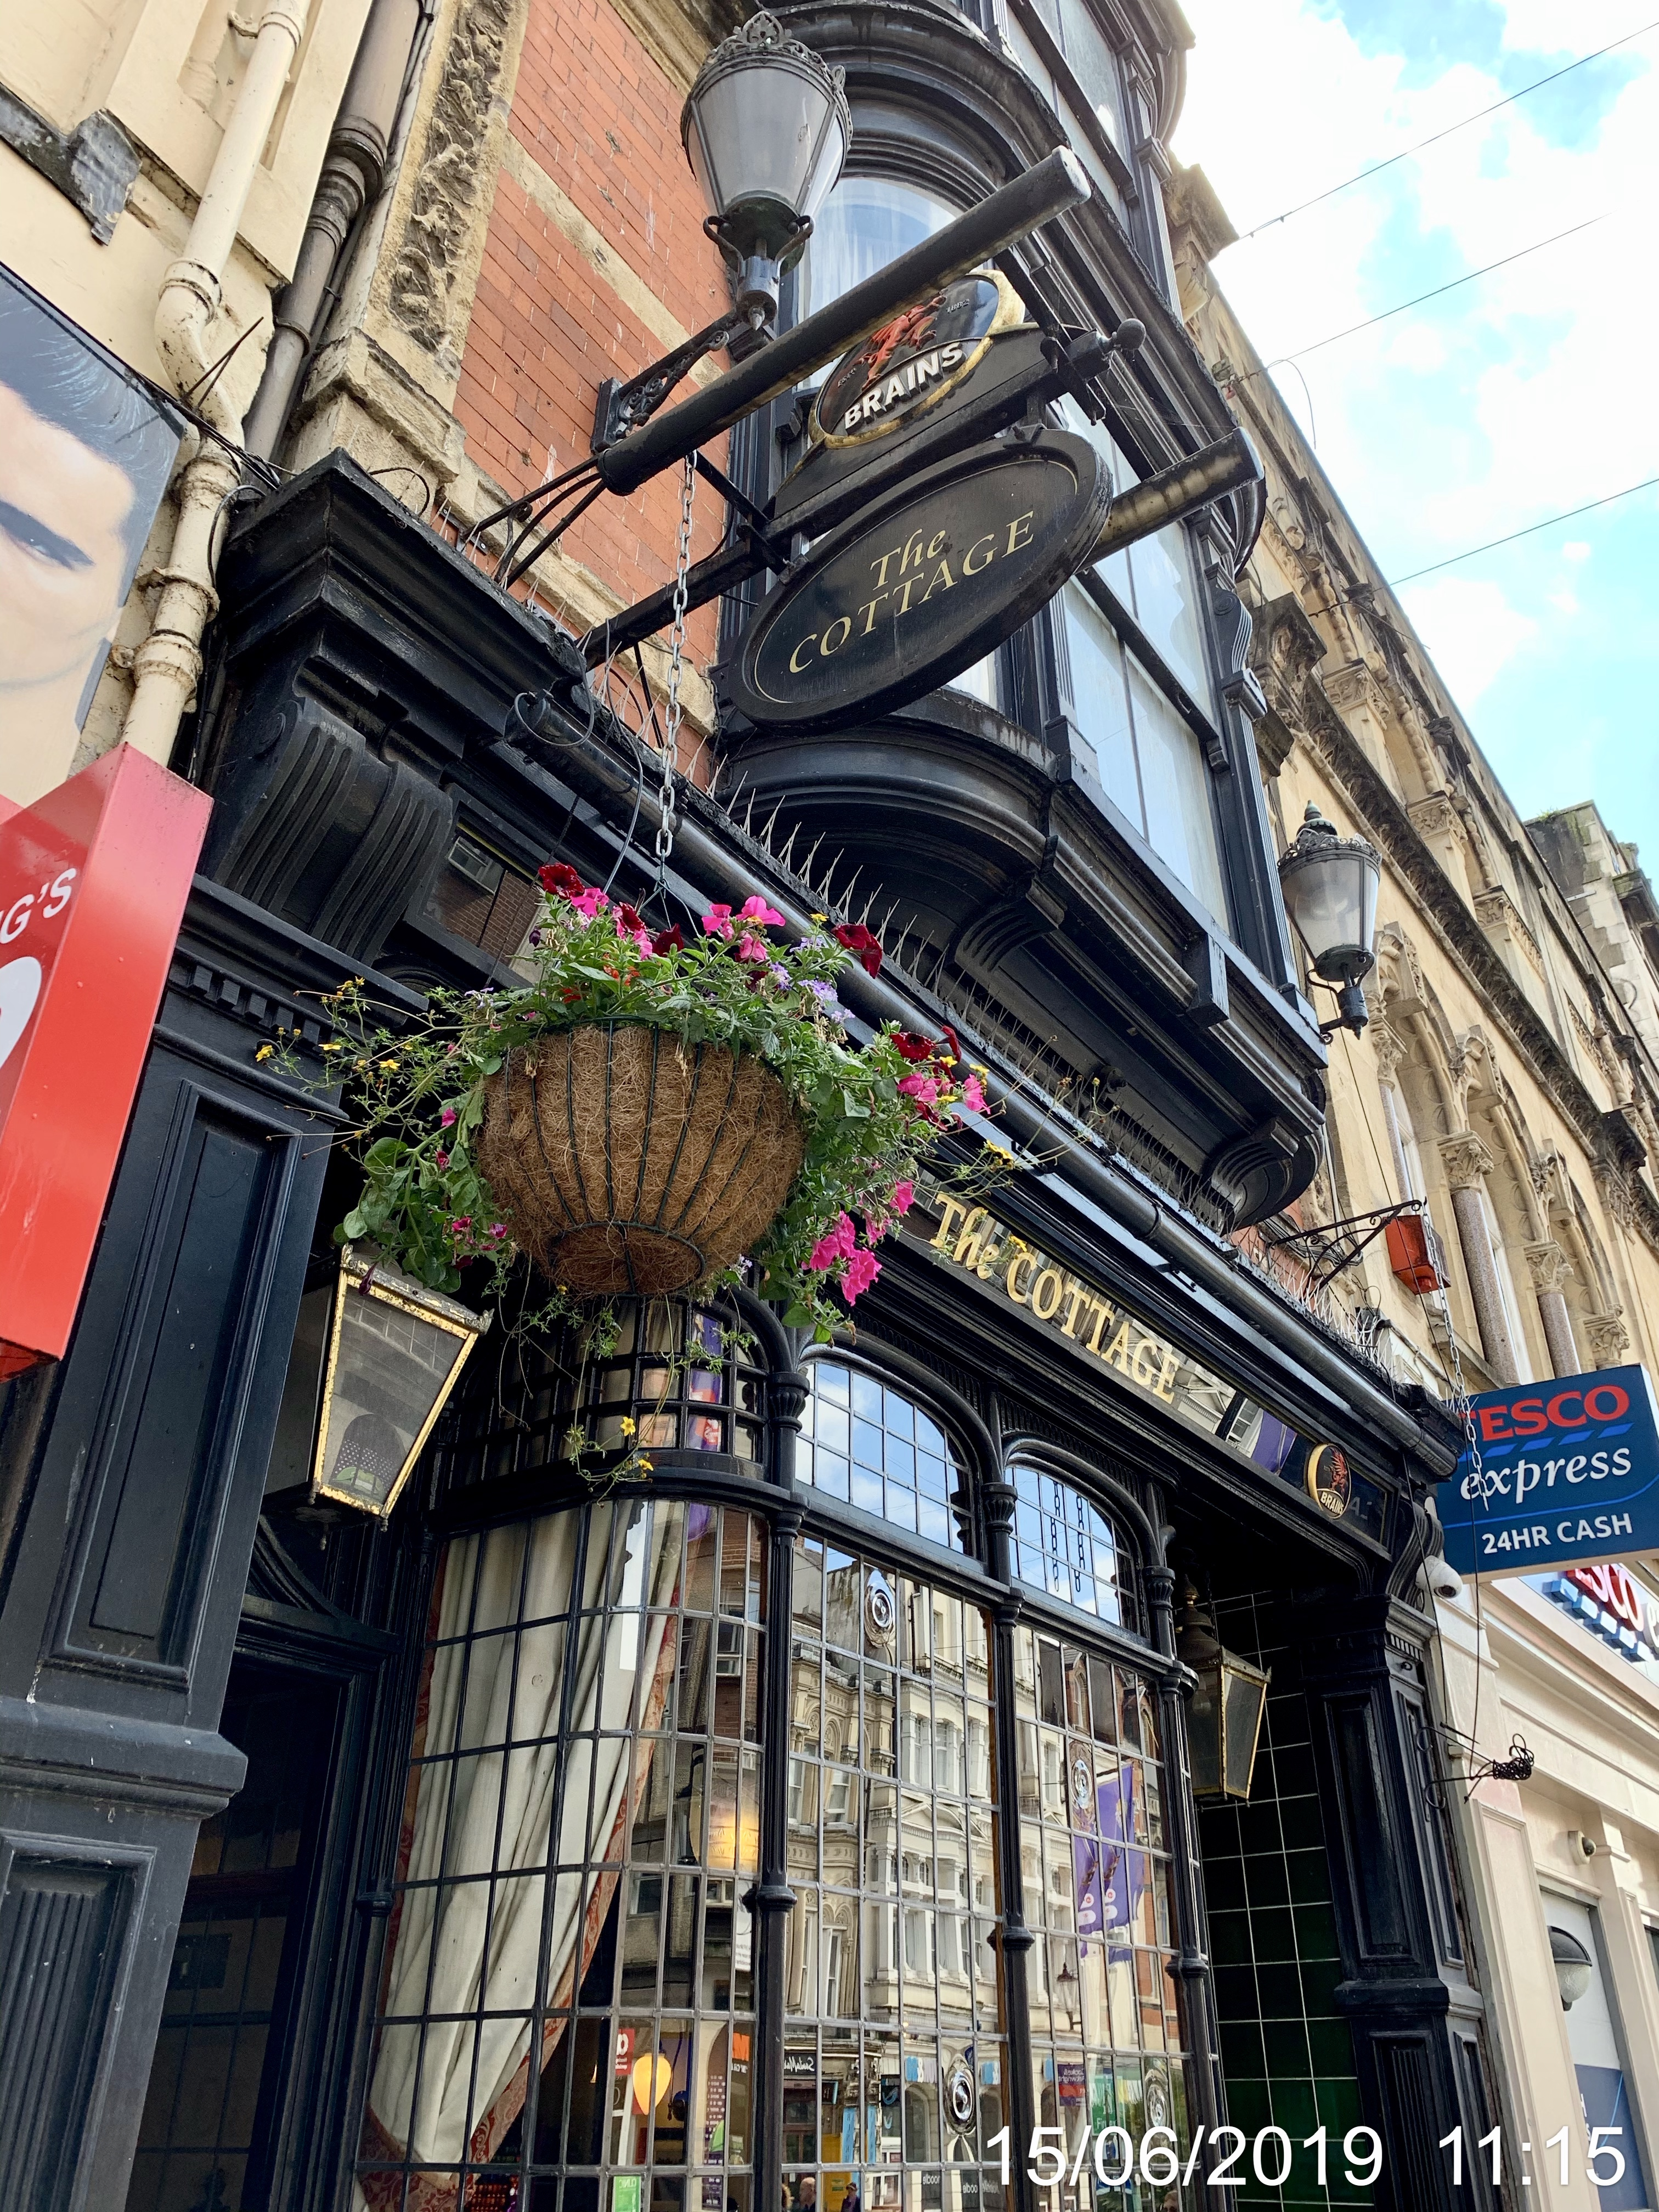 The Cottage - Cardiff. A Brains Pub